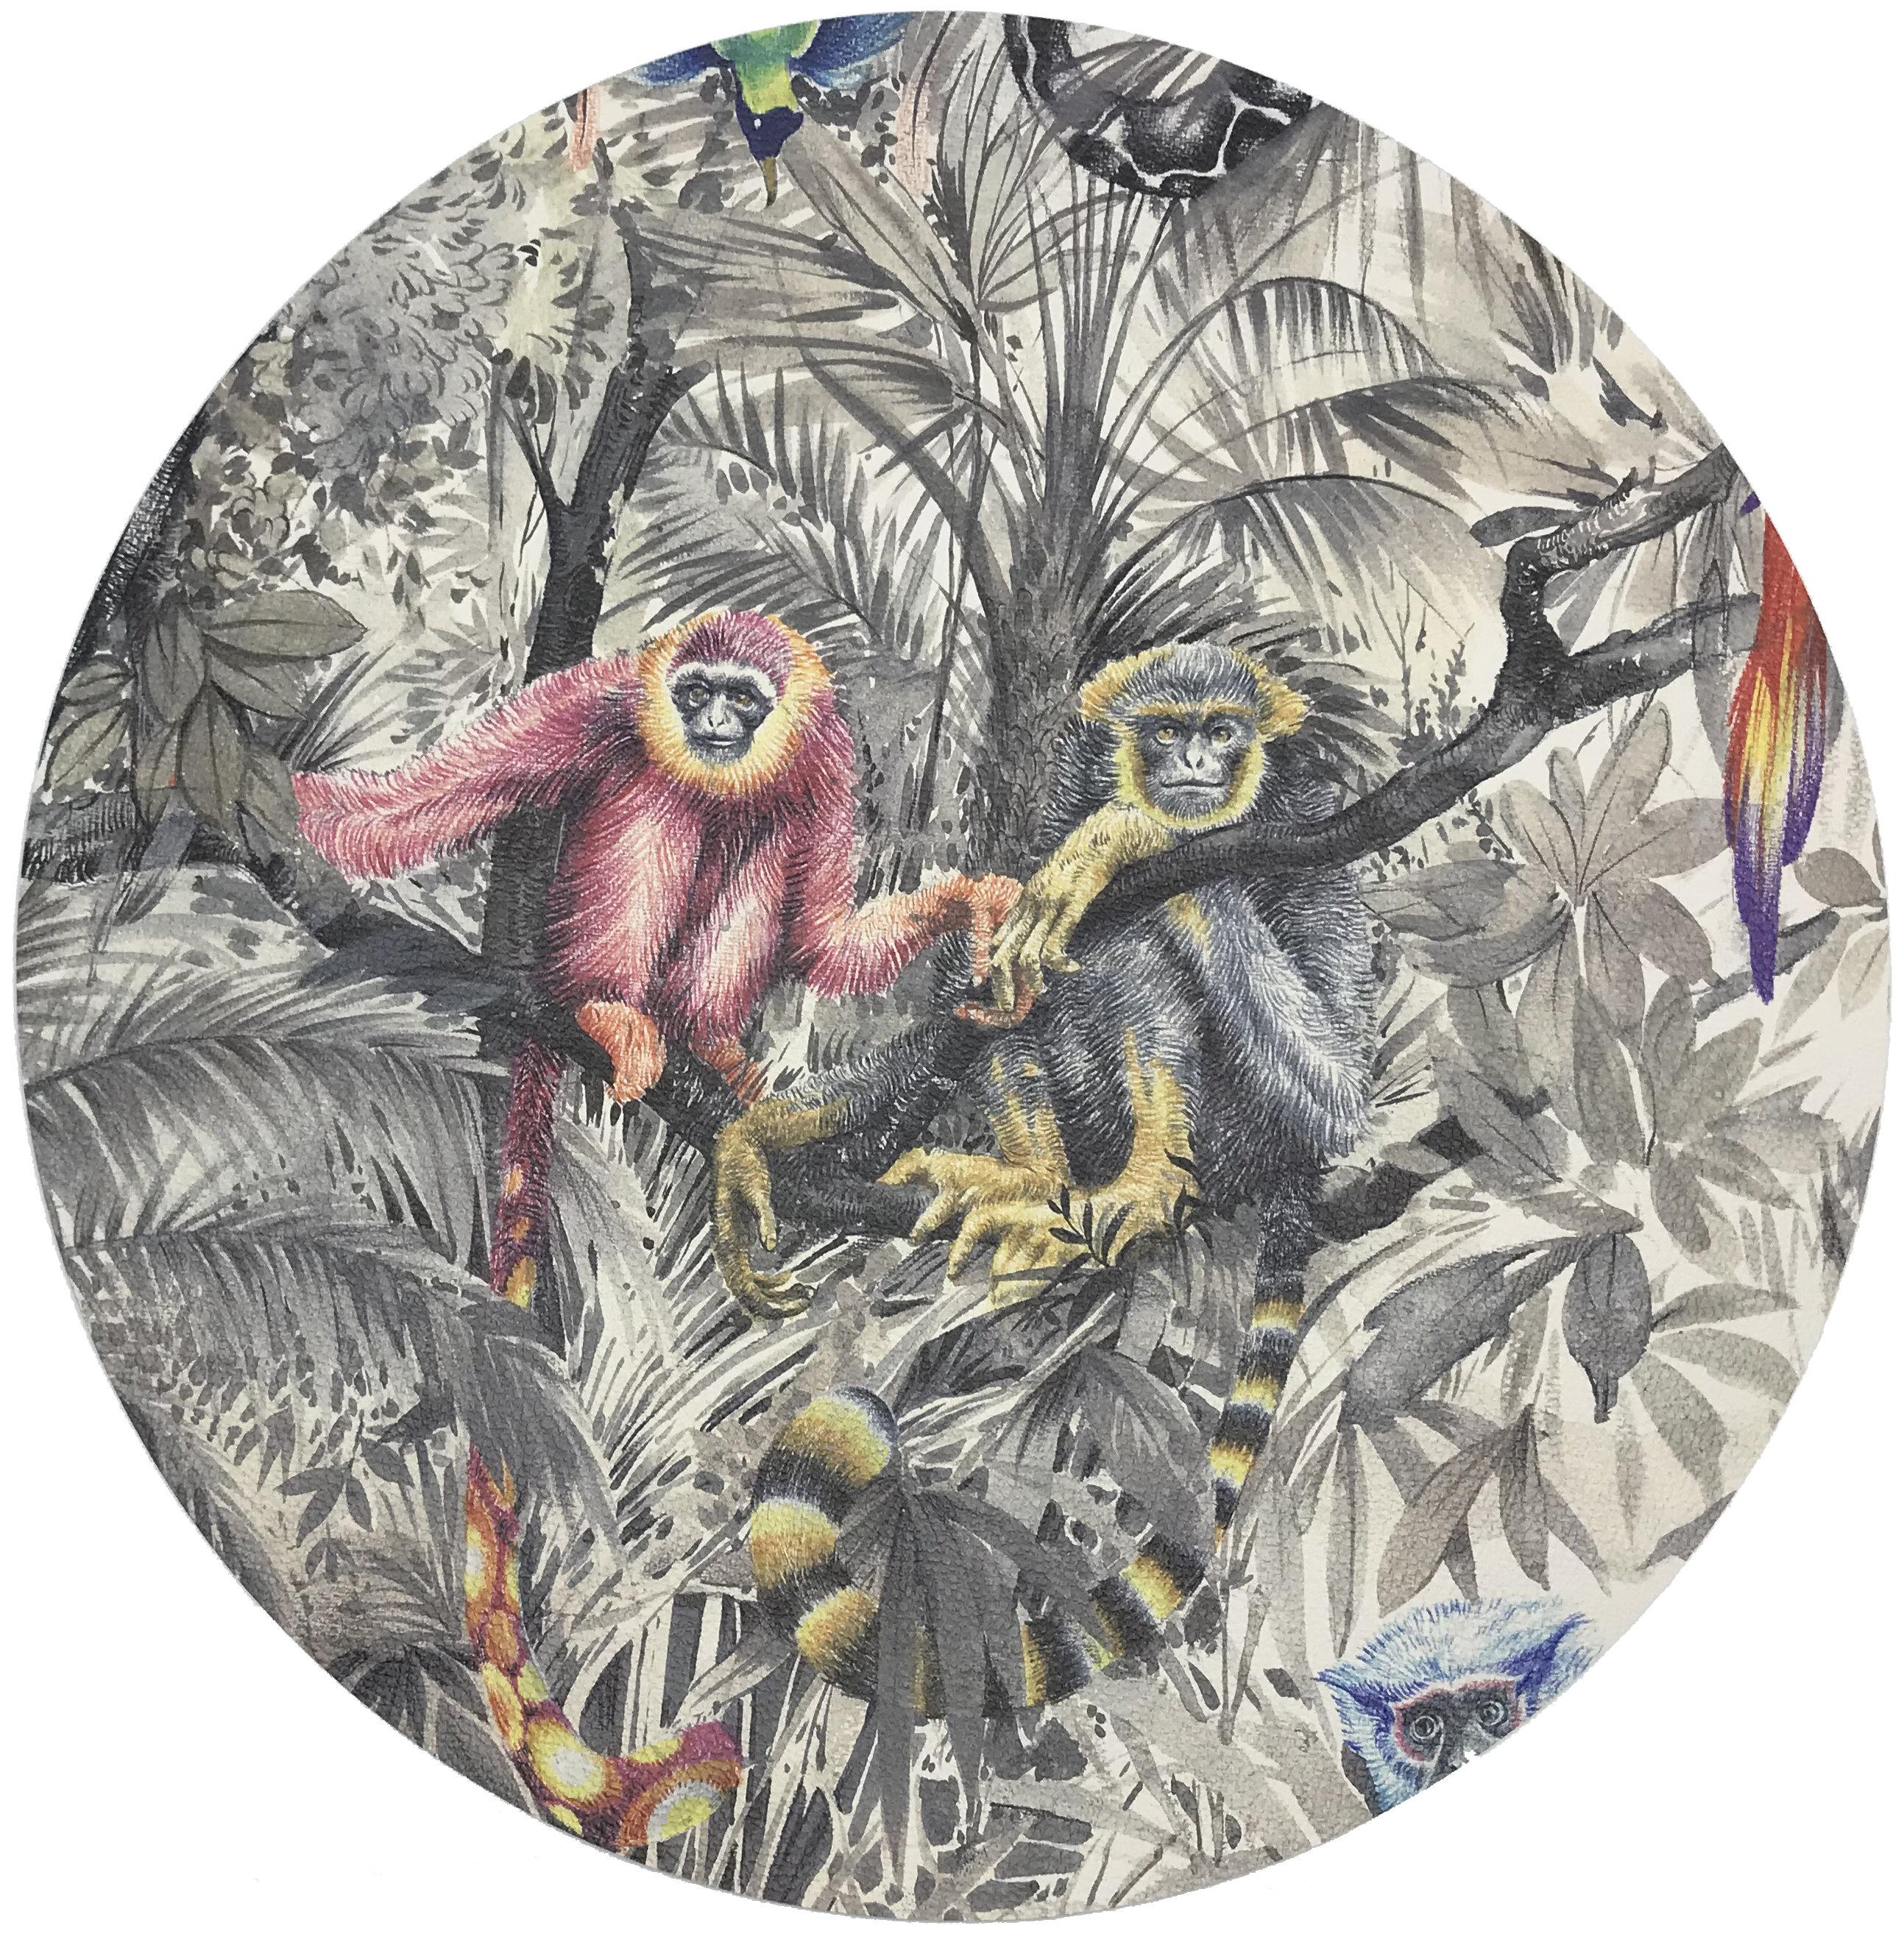 Nicolette Mayer Arcadia Monkeys Pebble 16 Vinyl Placemat Wayfair